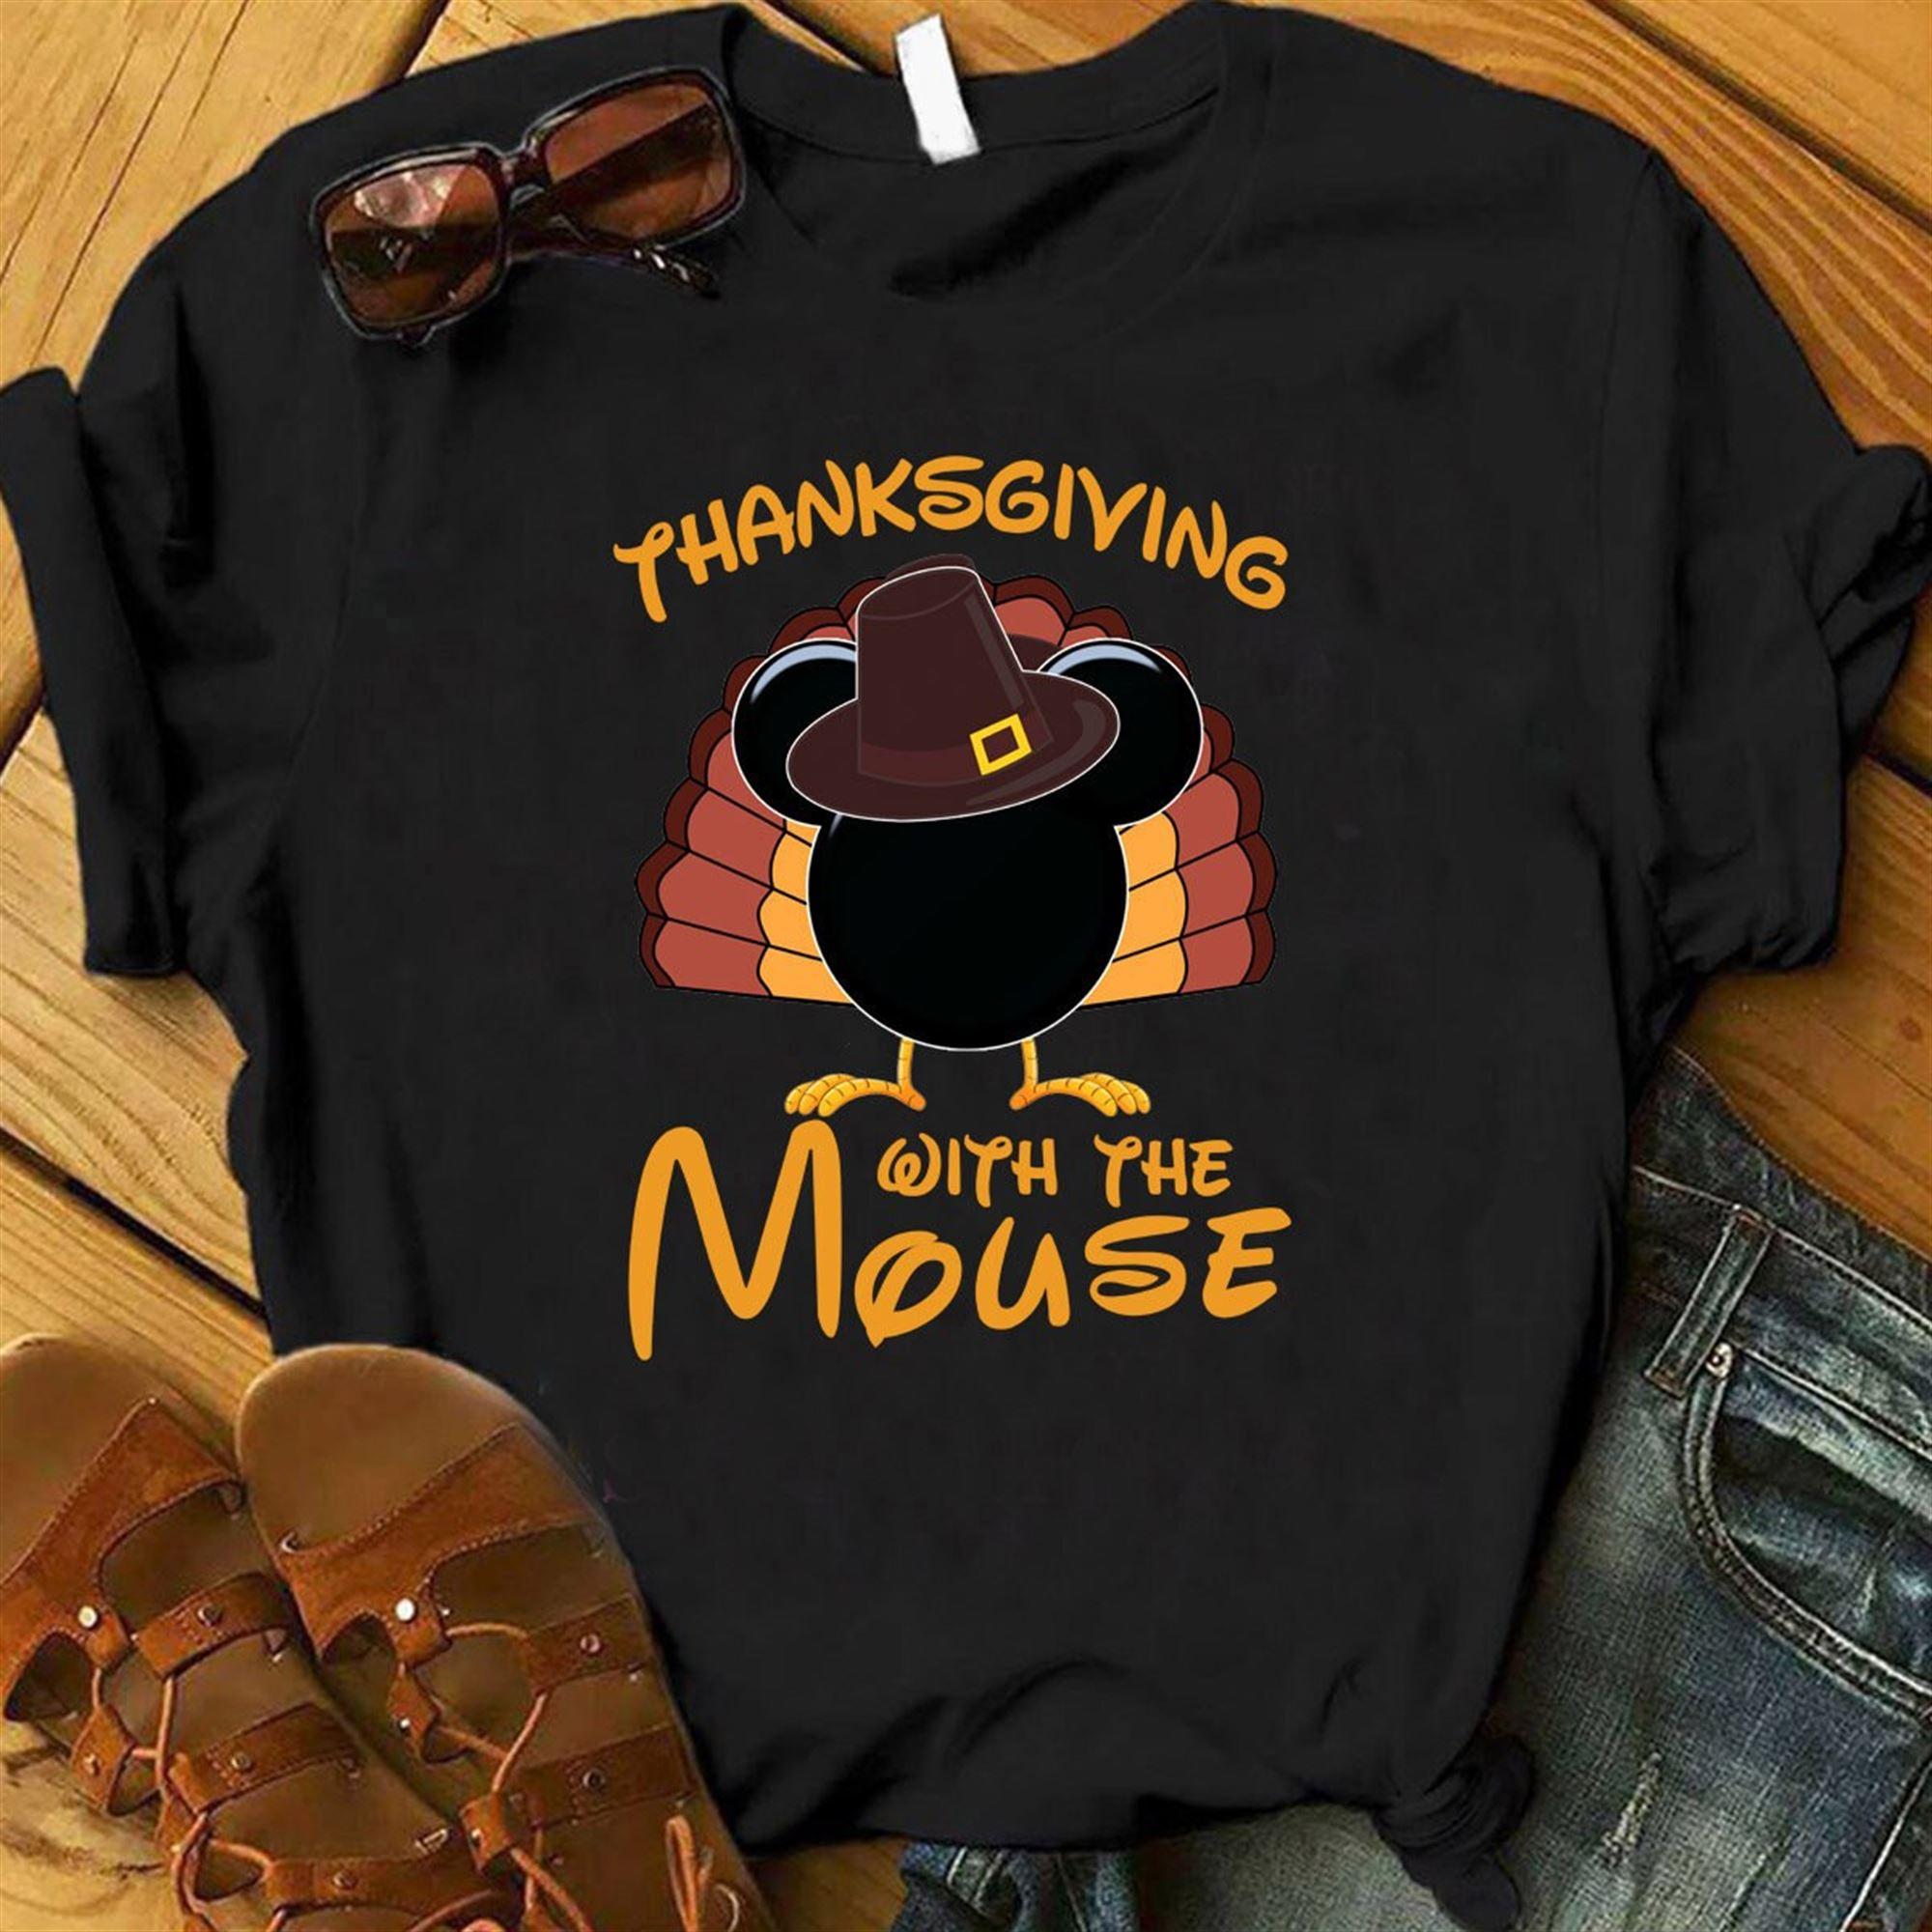 Disney Thanksgiving Shirt Cute Disney Thanksgiving Shirt Disney Thanksgiving Shirt Disney Thanksgiving Matching Family Shirts